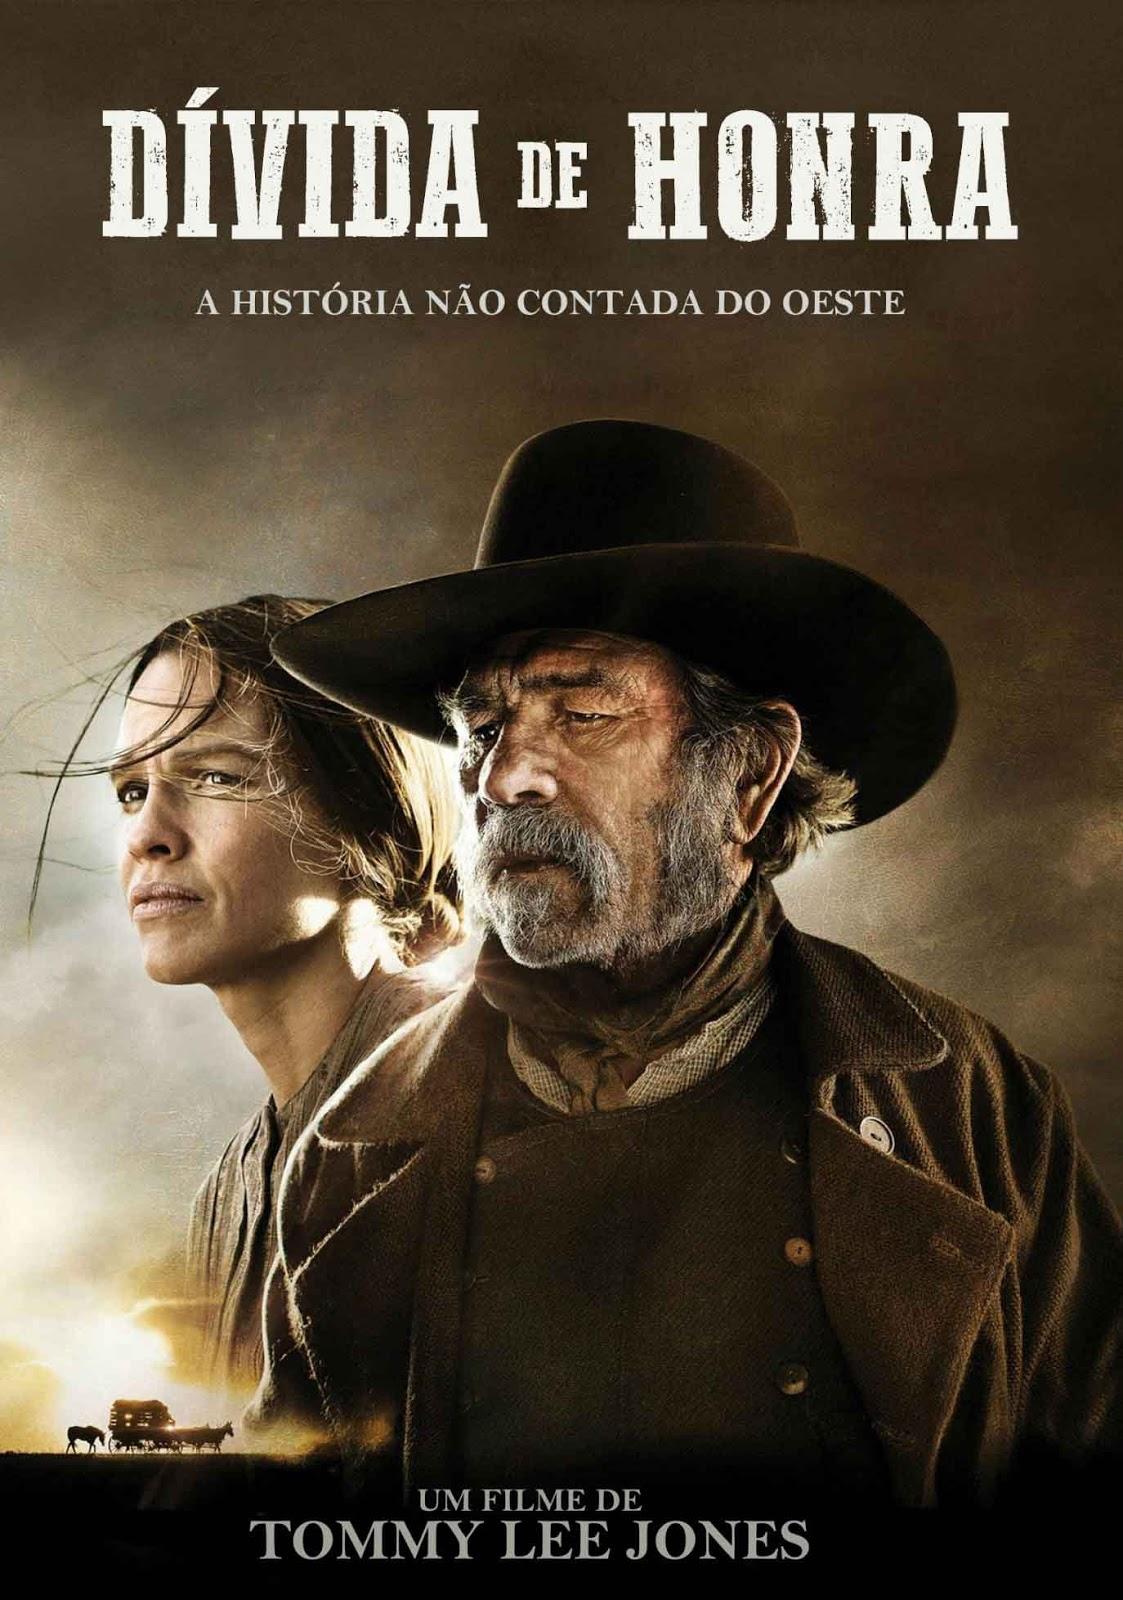 Dívida de Honra Torrent - Blu-ray Rip 1080p Dual Áudio (2015)